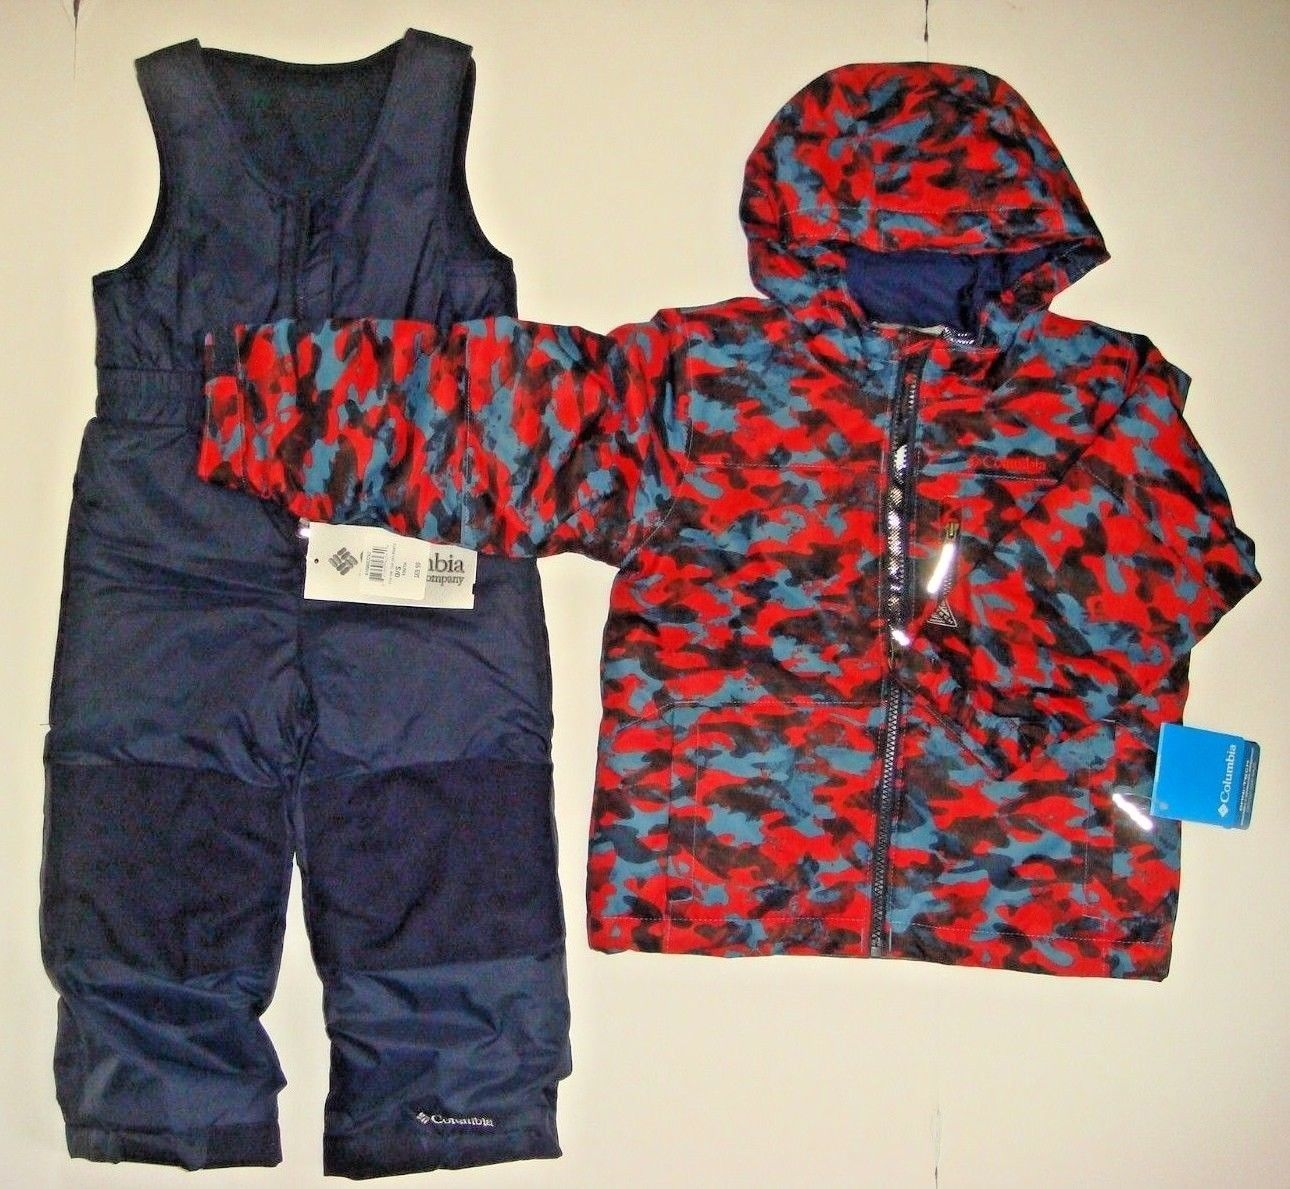 528b28add Nwt Columbia Youth Boys Ski Snow Jacket+Bib and 50 similar items